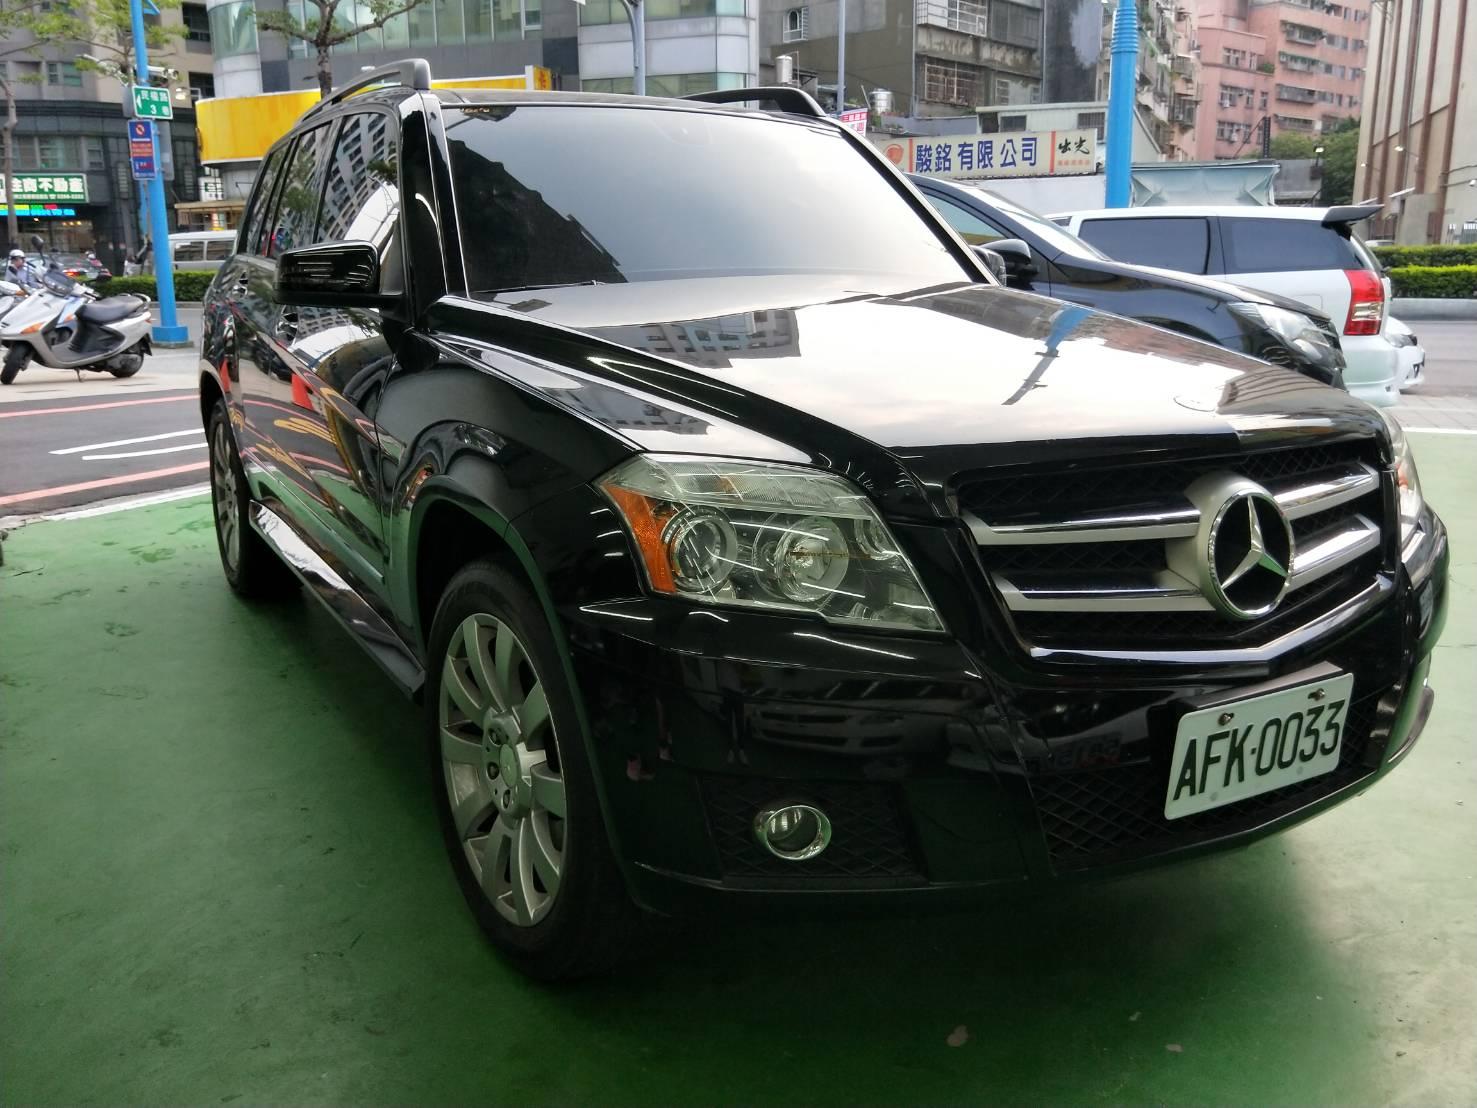 M-Benz 賓士 2010 GLK-Class